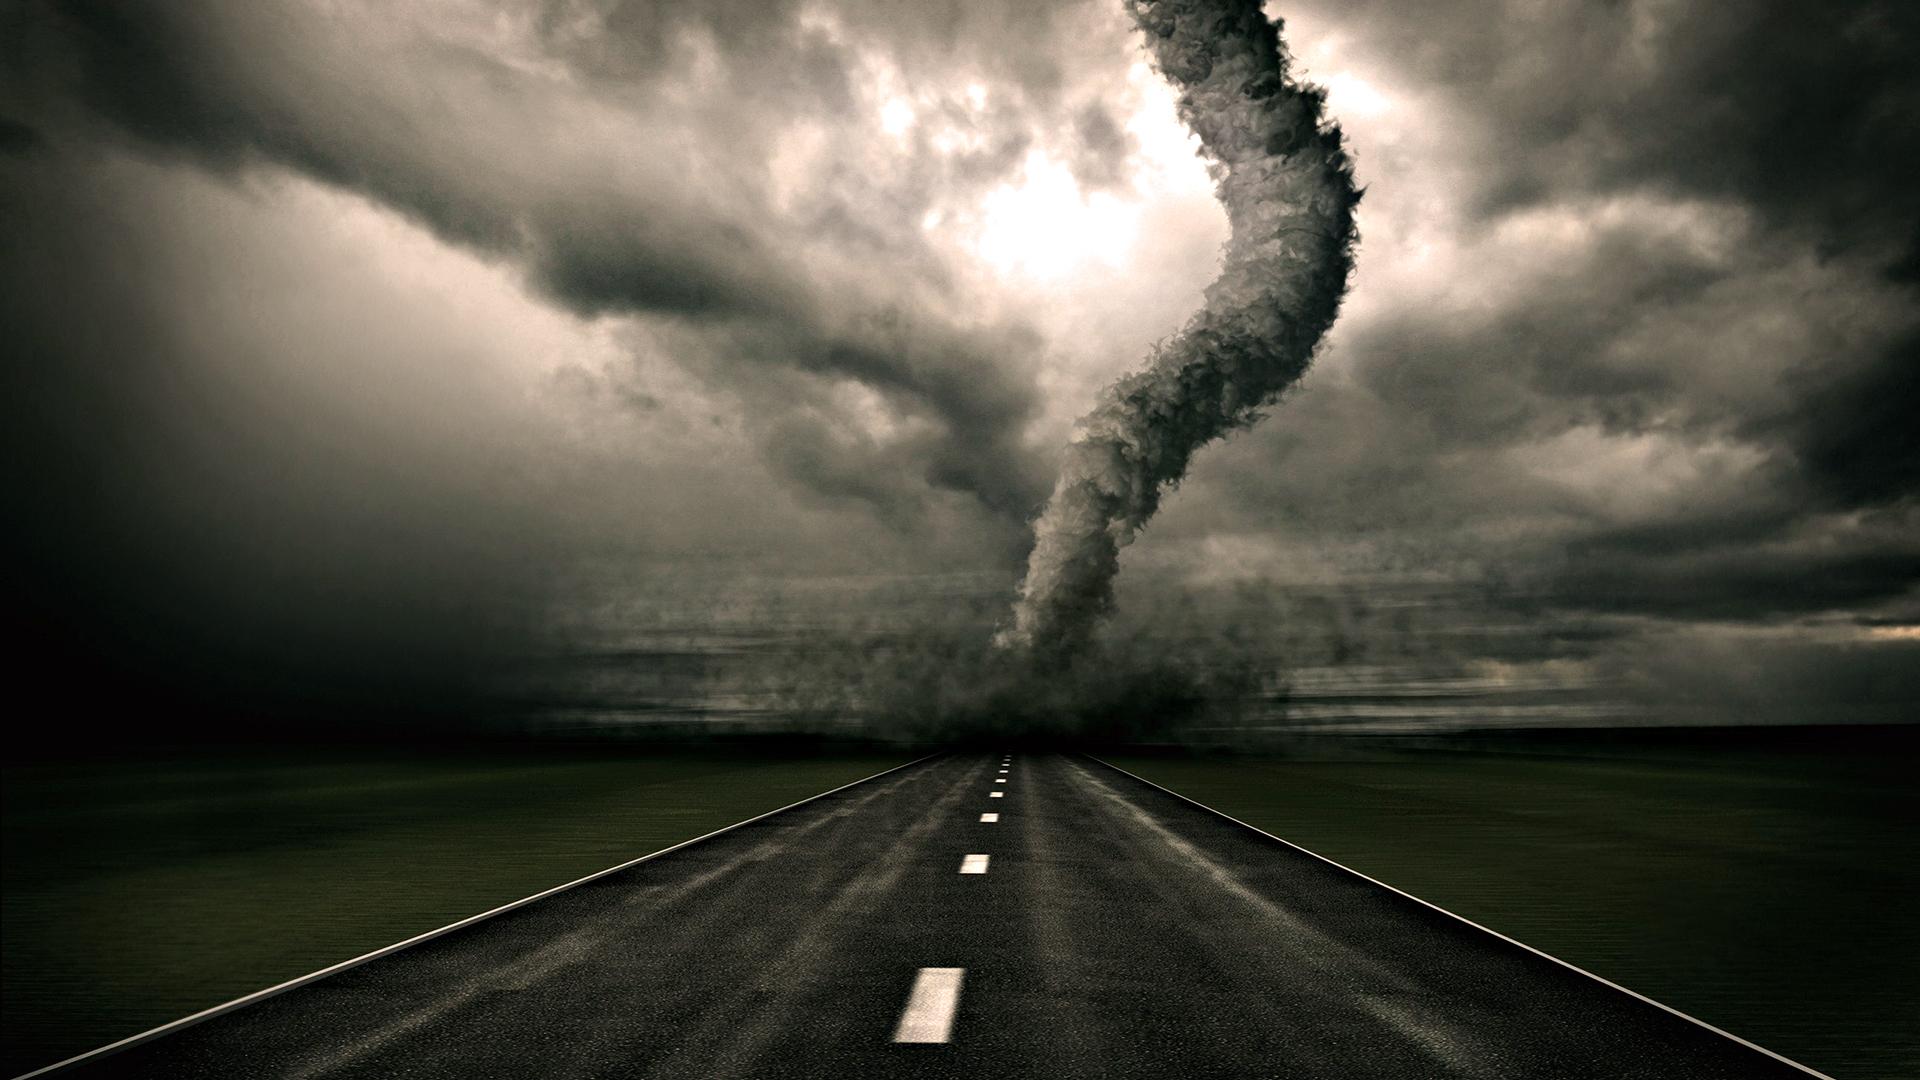 Tornado Image Cool